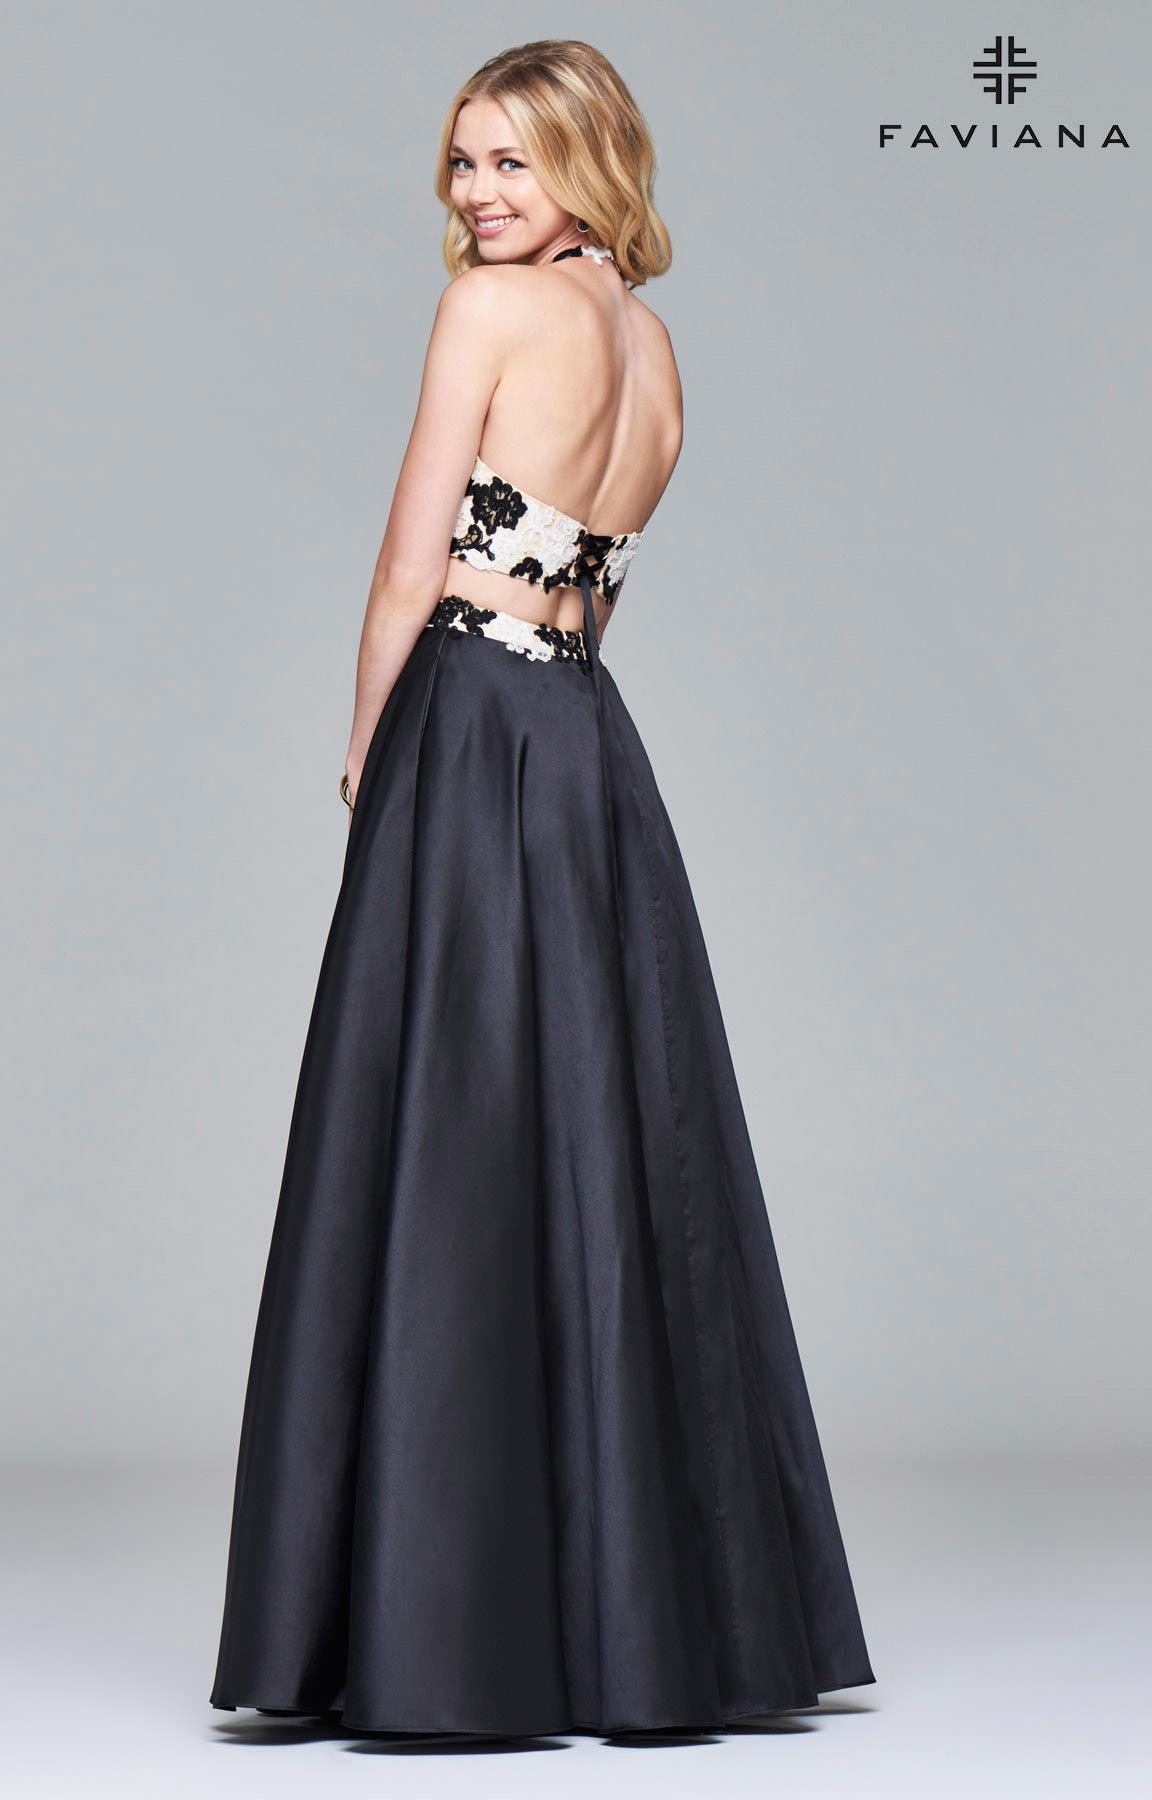 Faviana 7936 Black Ivory Lace Two Piece Prom Dress